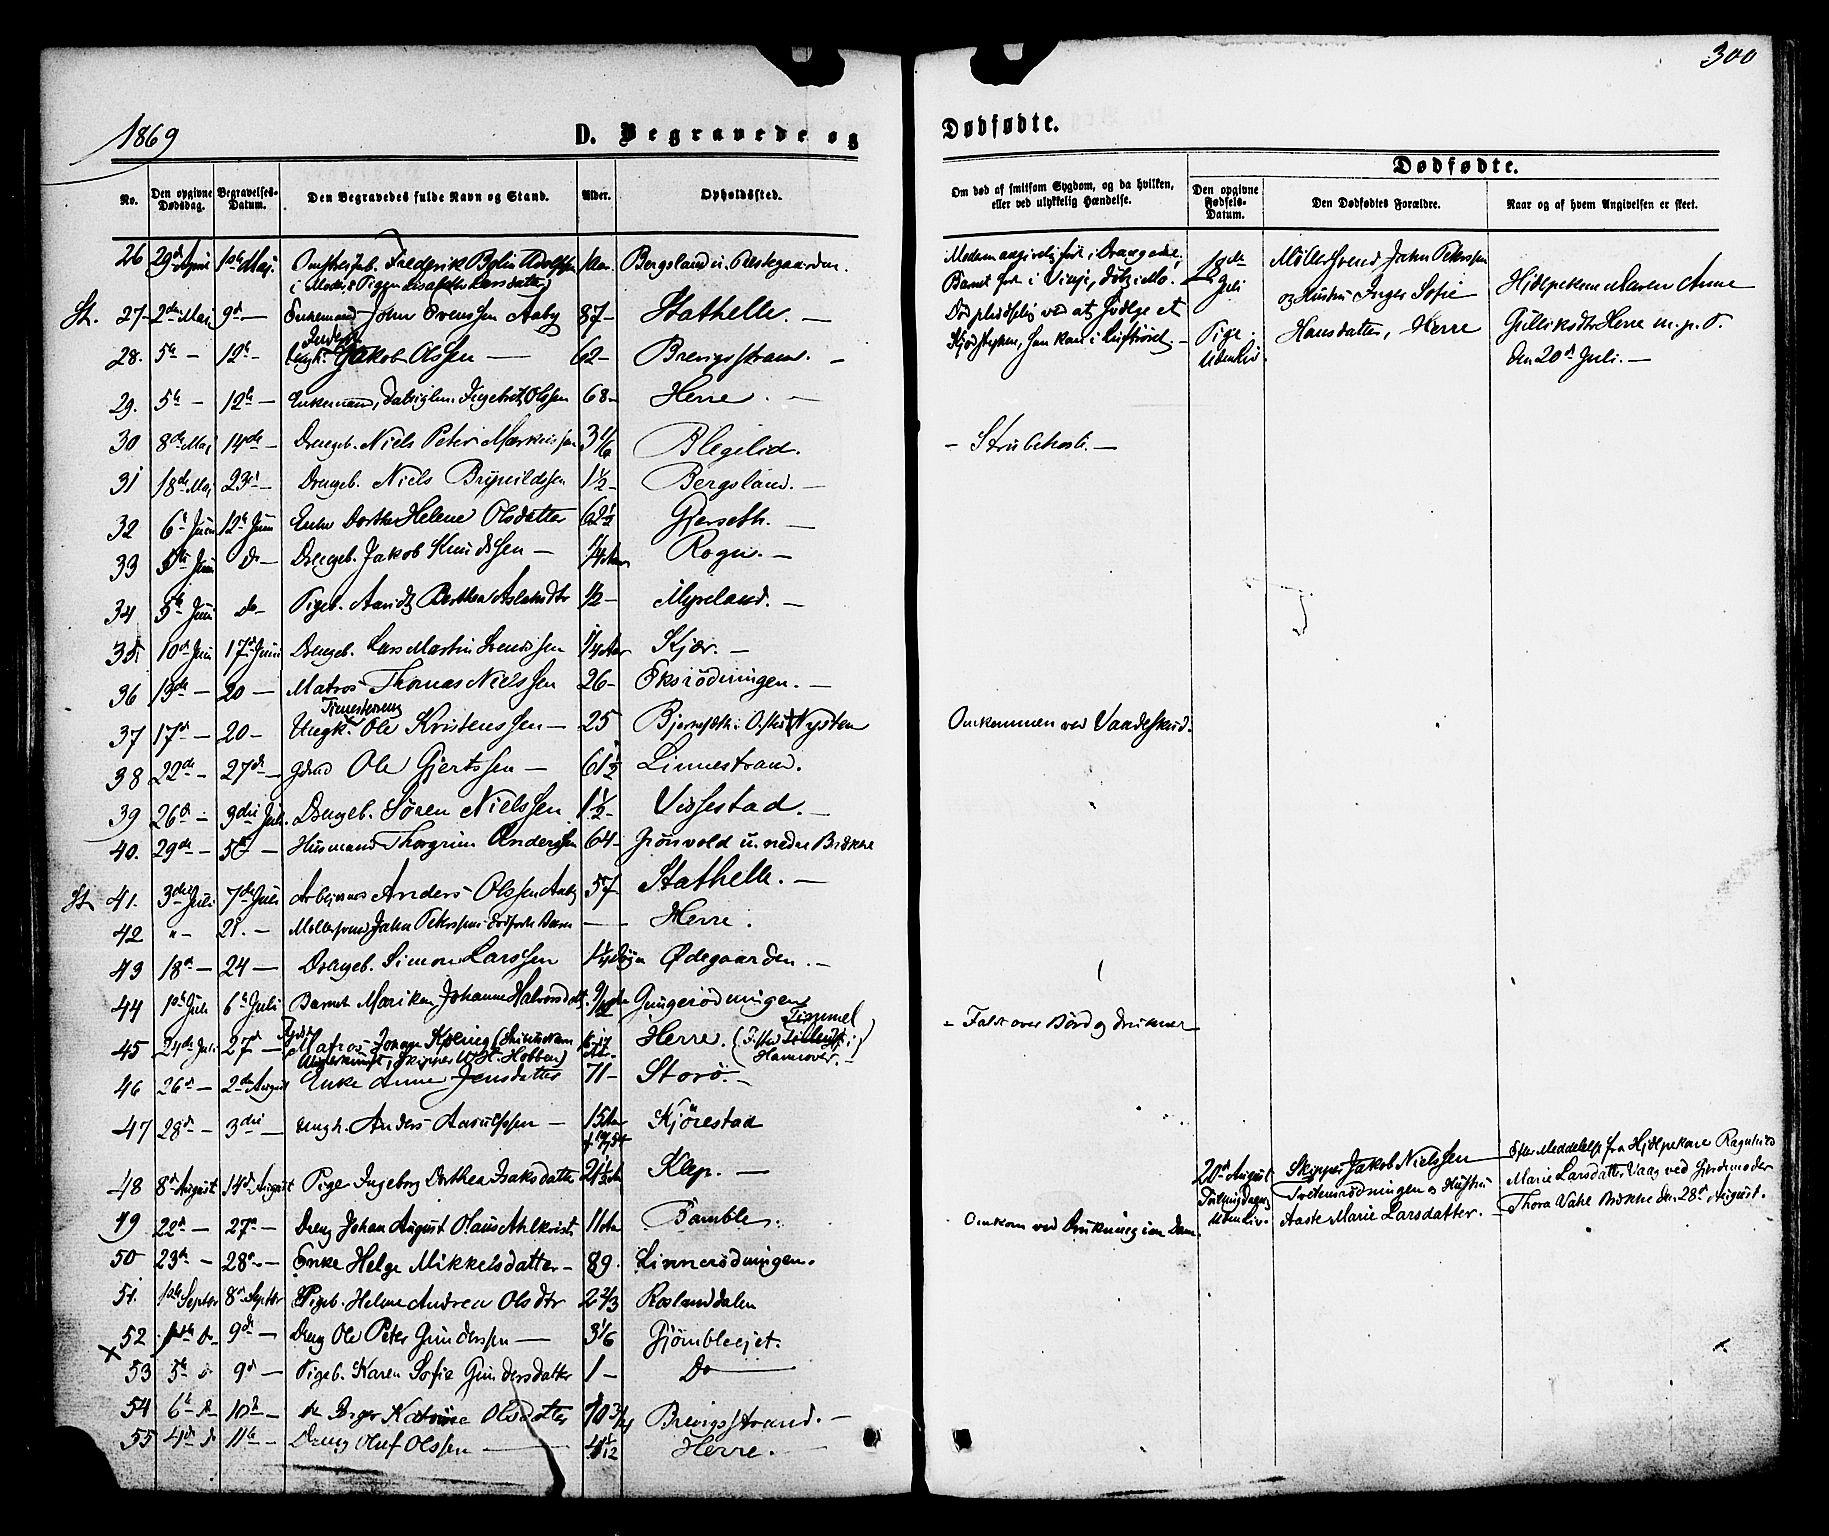 SAKO, Bamble kirkebøker, F/Fa/L0006: Ministerialbok nr. I 6, 1869-1877, s. 300